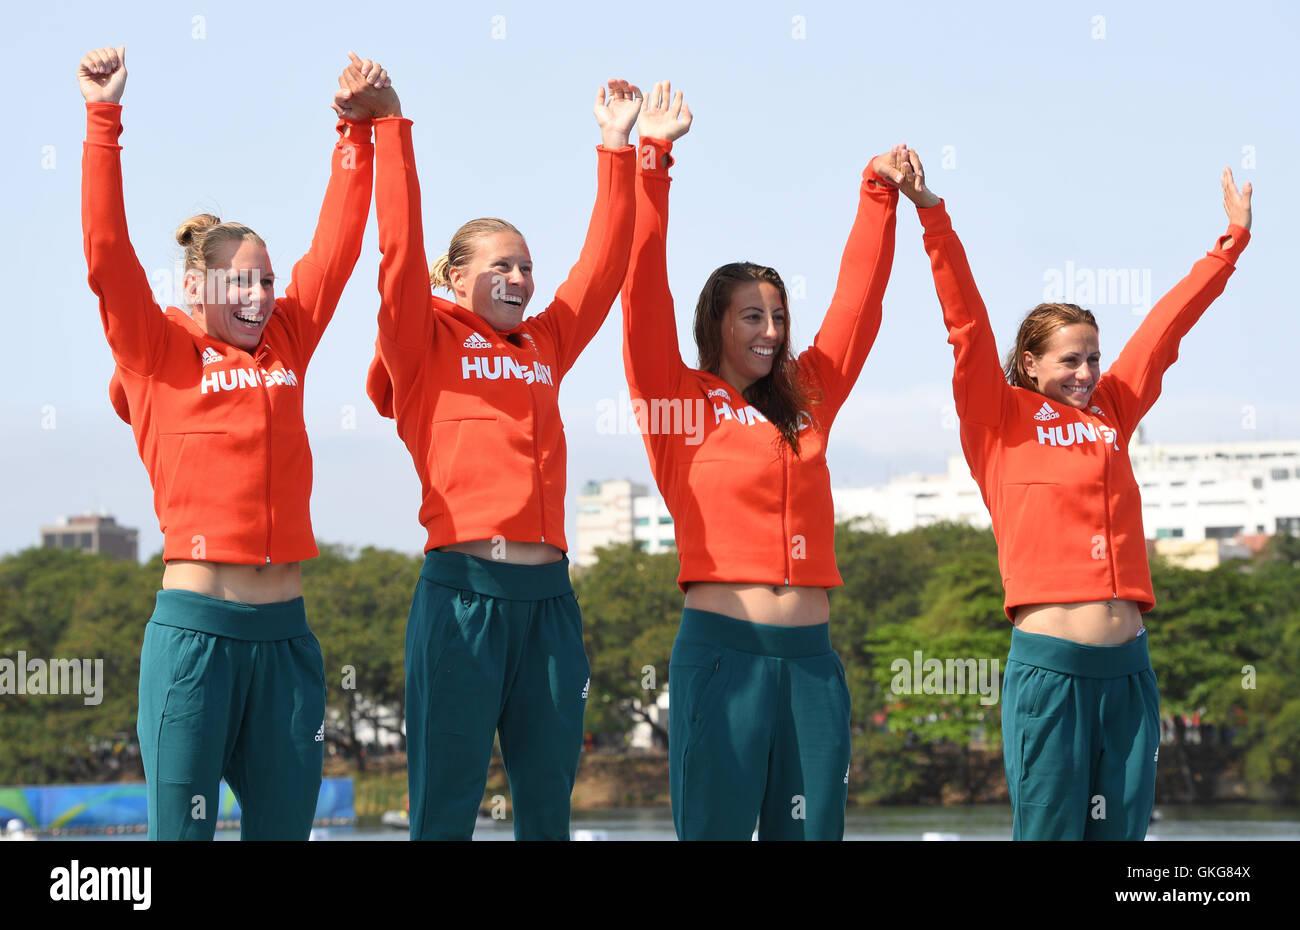 Rio de Janeiro, Brazil. 20th Aug, 2016. L-R: Gold medalists Gabriella Szabo, Danuta Kozak, Tamara Csipes and Krisztina - Stock Image